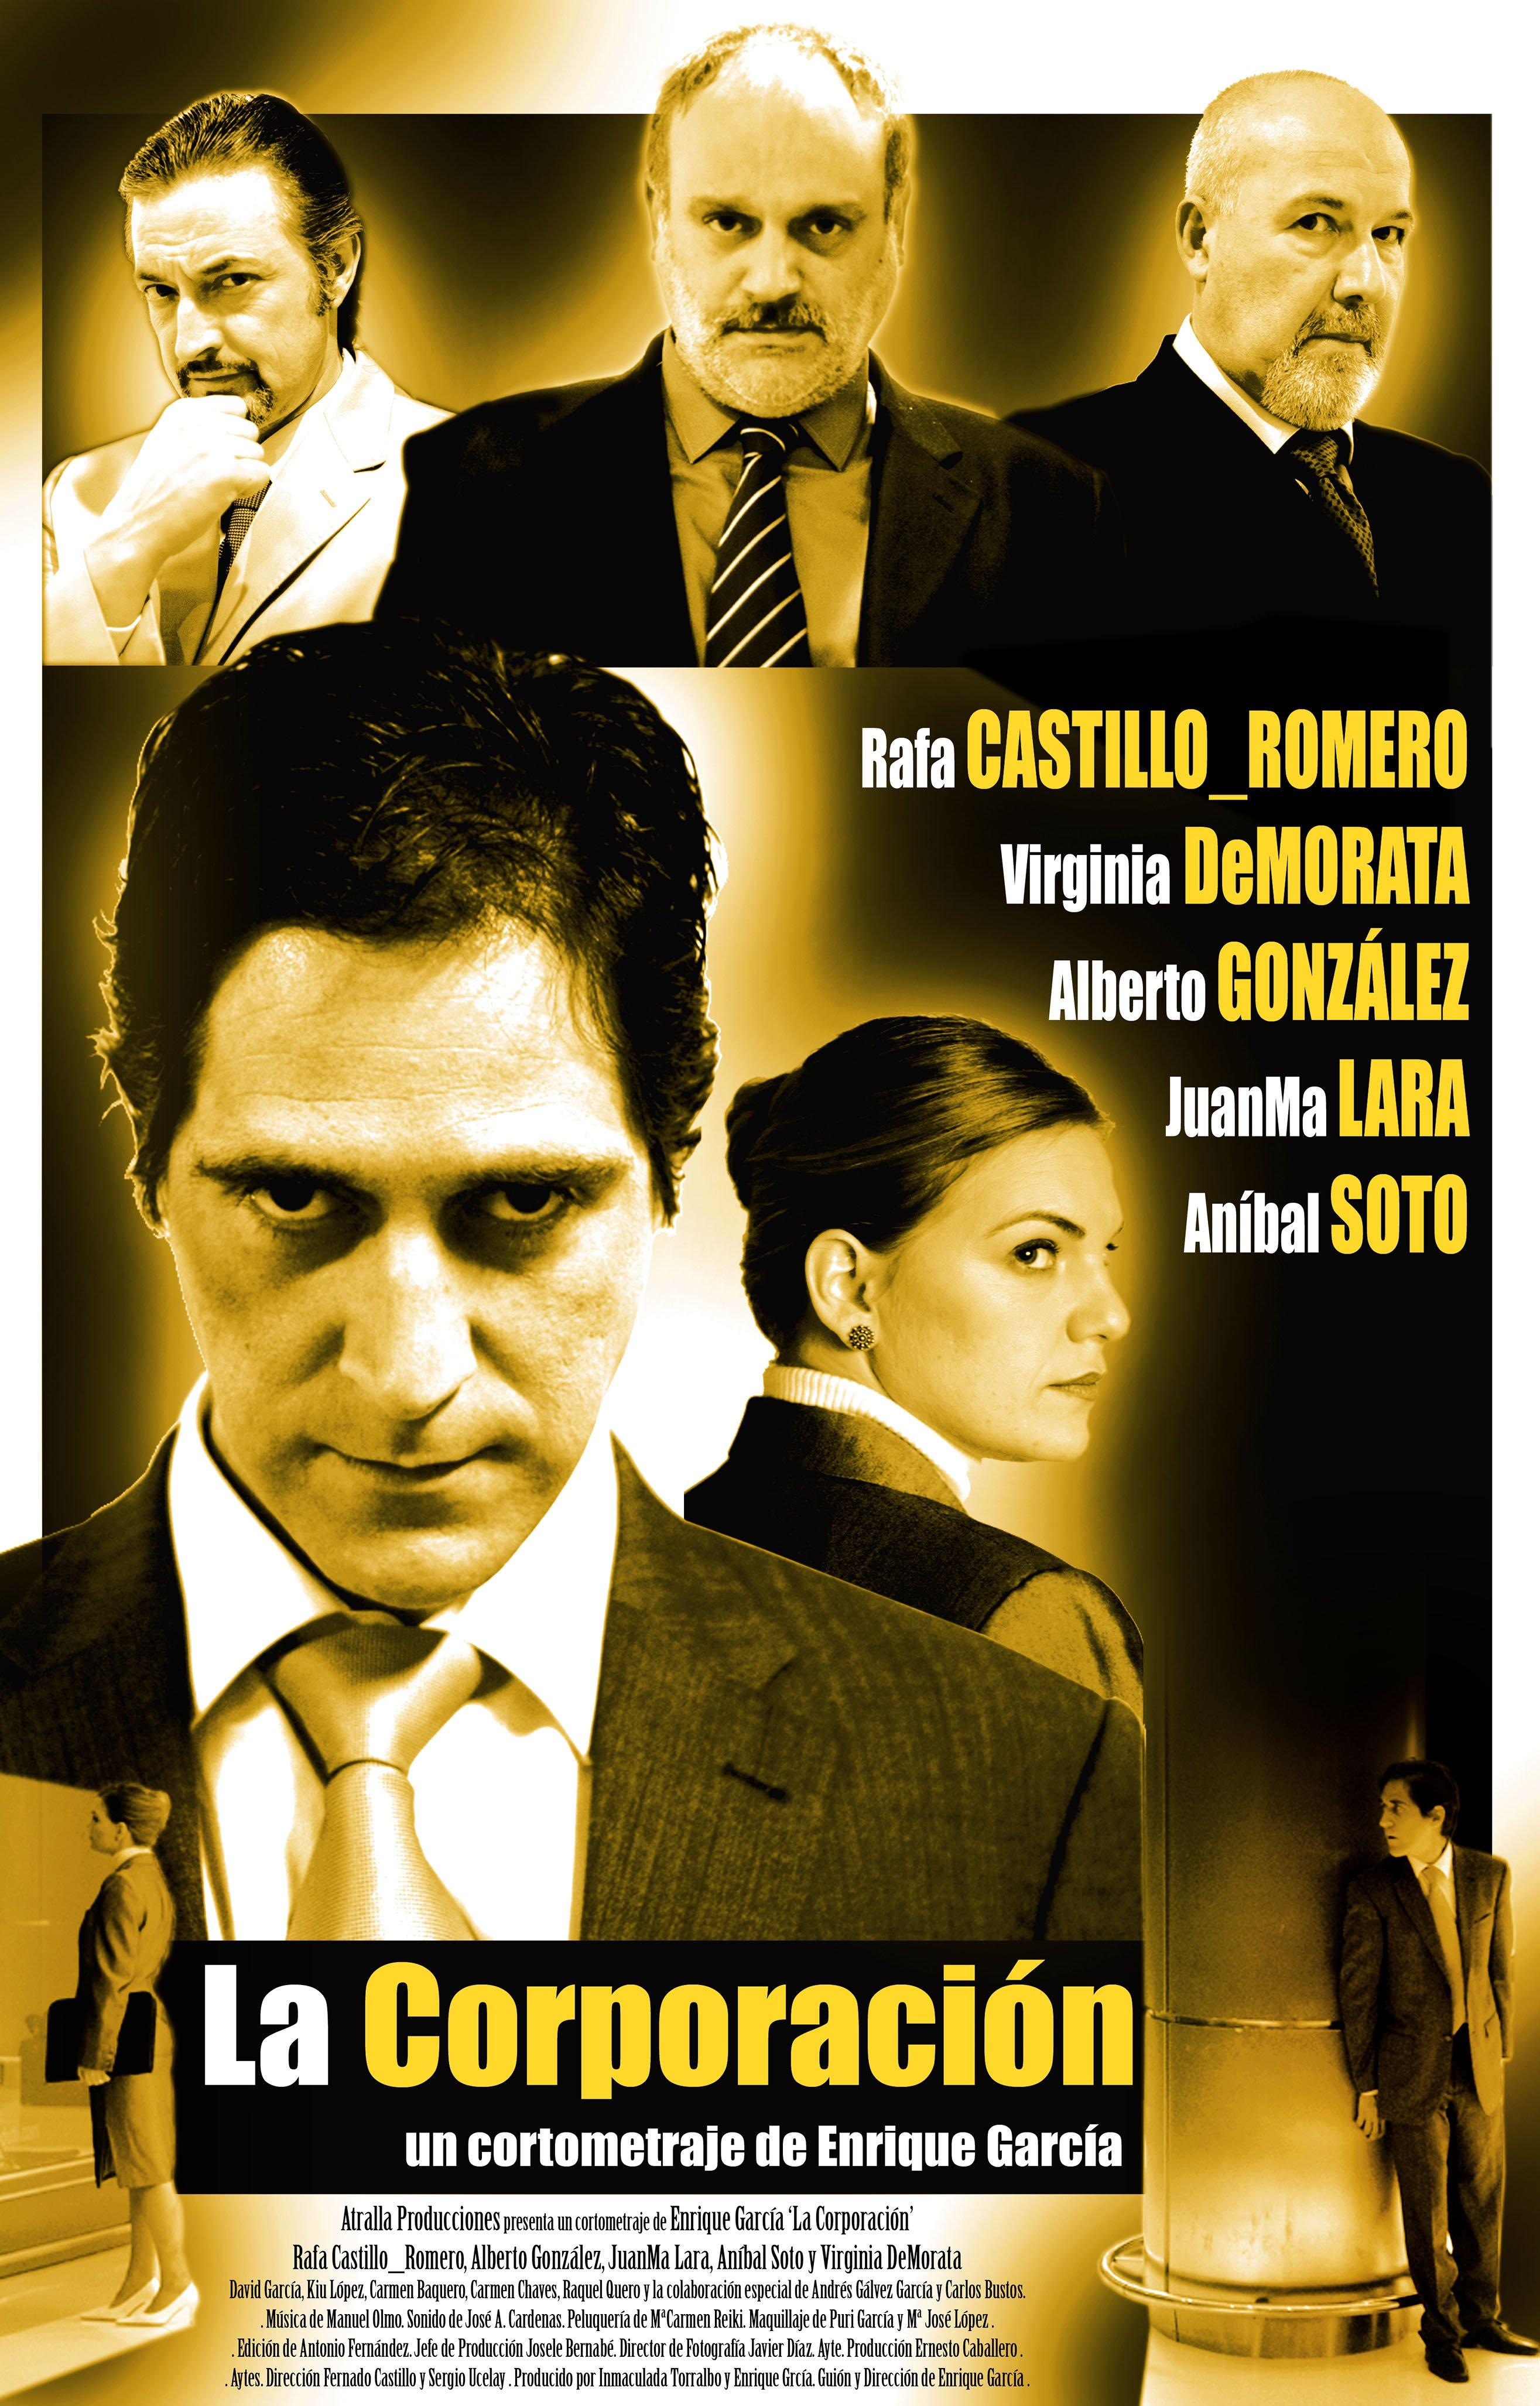 Alberto González, Aníbal Soto, Juanma Lara, Virginia de Morata, and Rafa Castillo-Romero in La Corporación (2008)